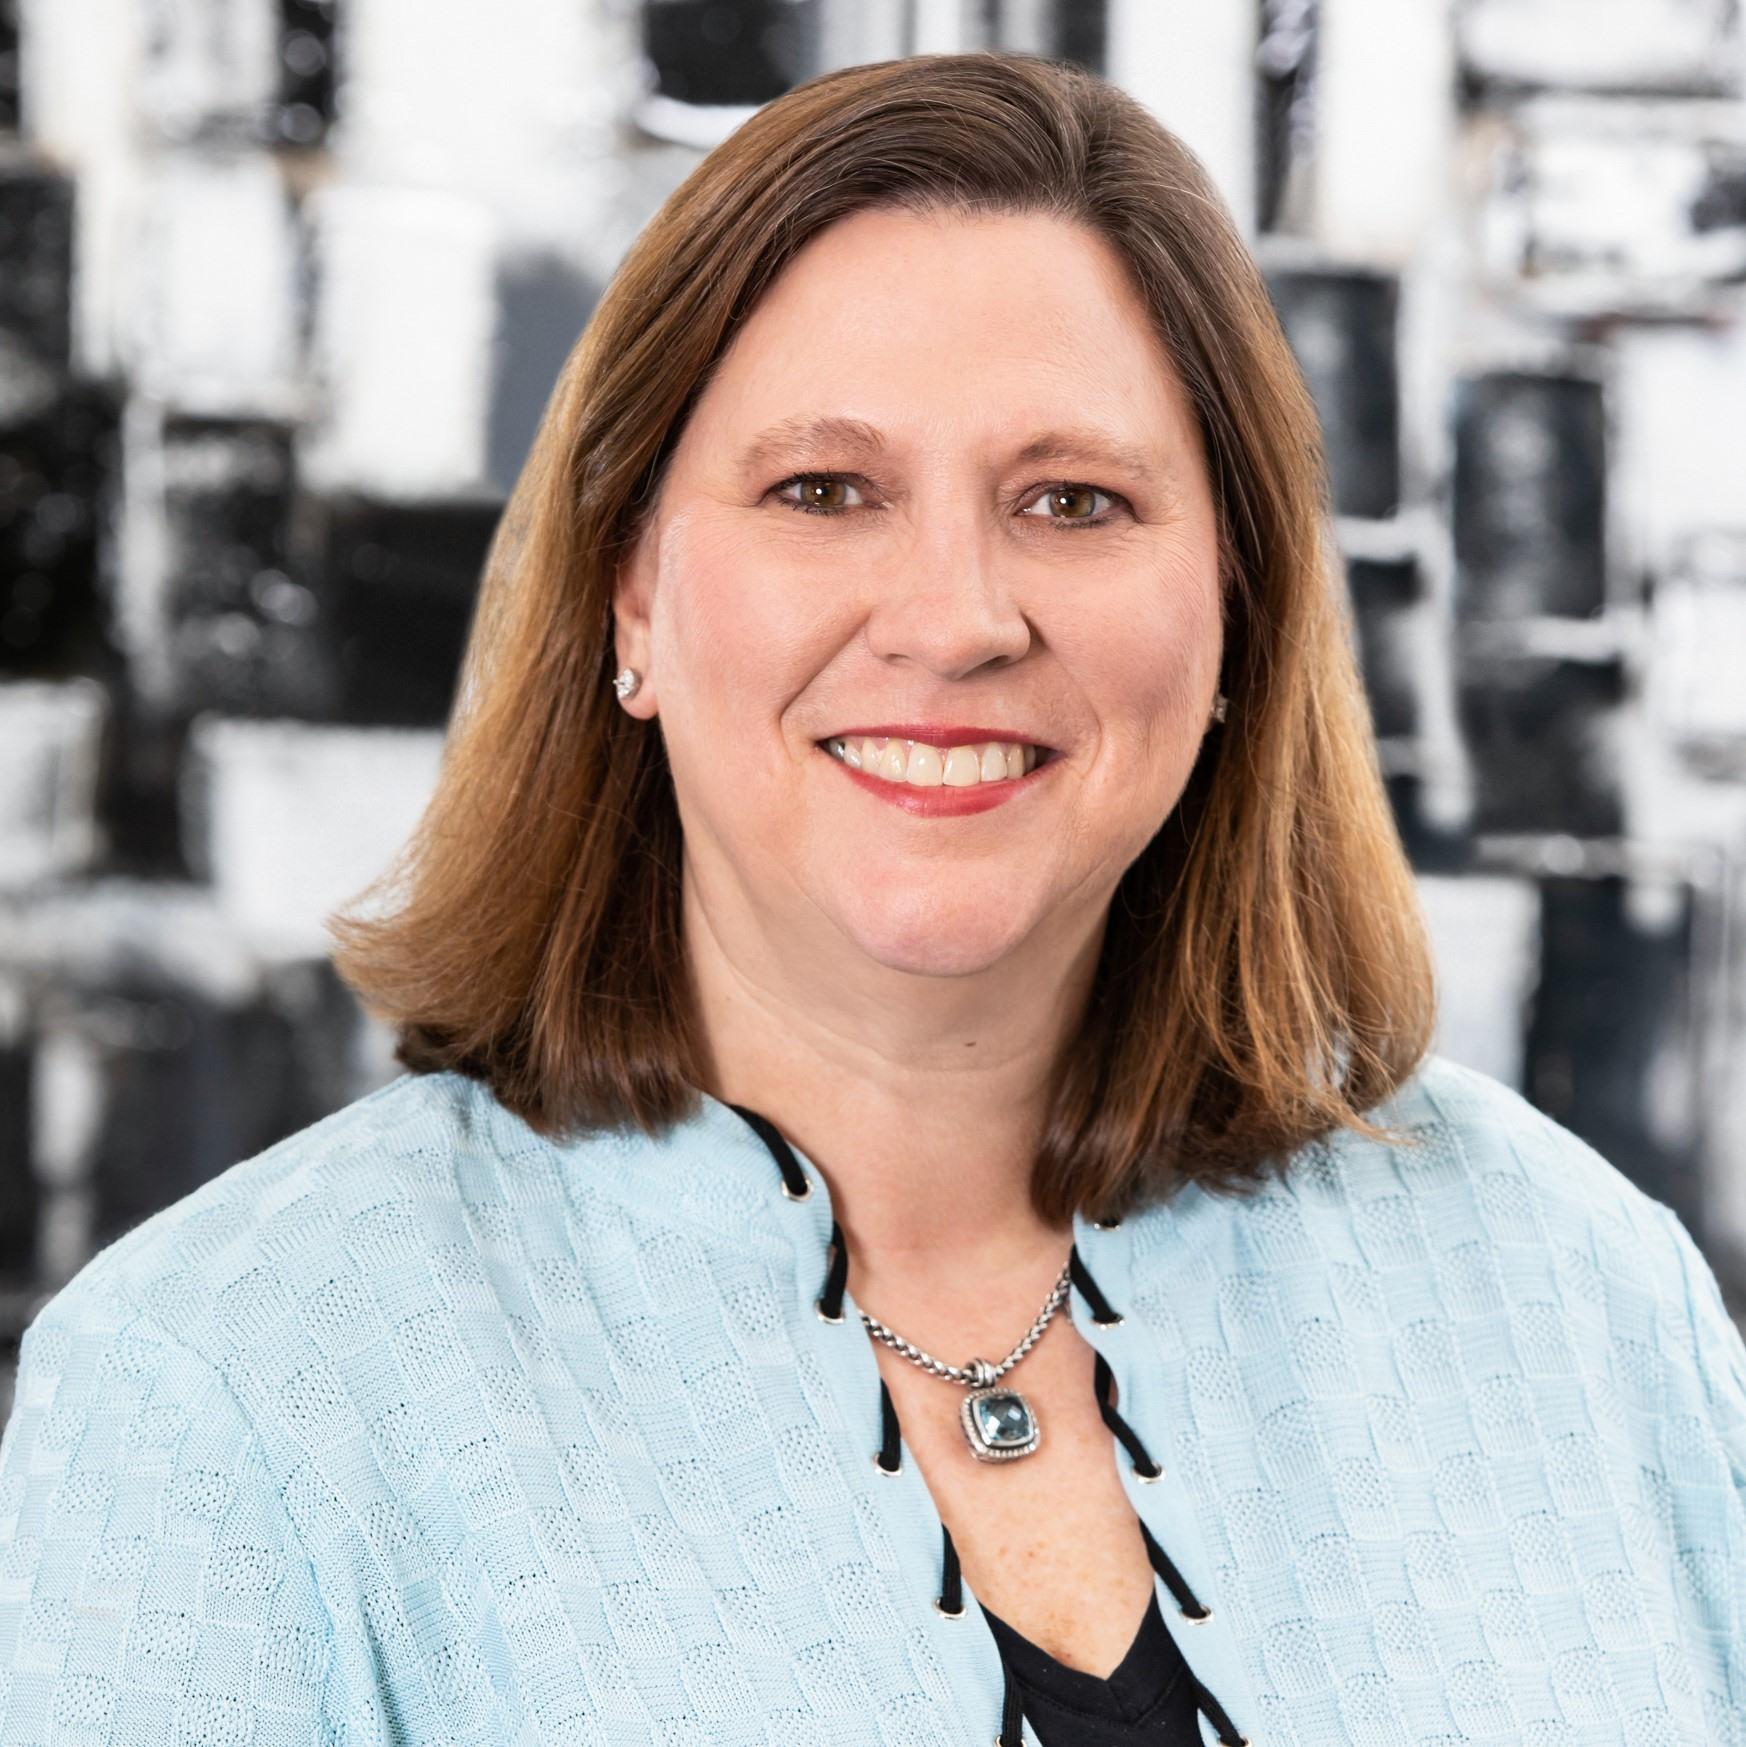 Texas State Representative Julie Johnson